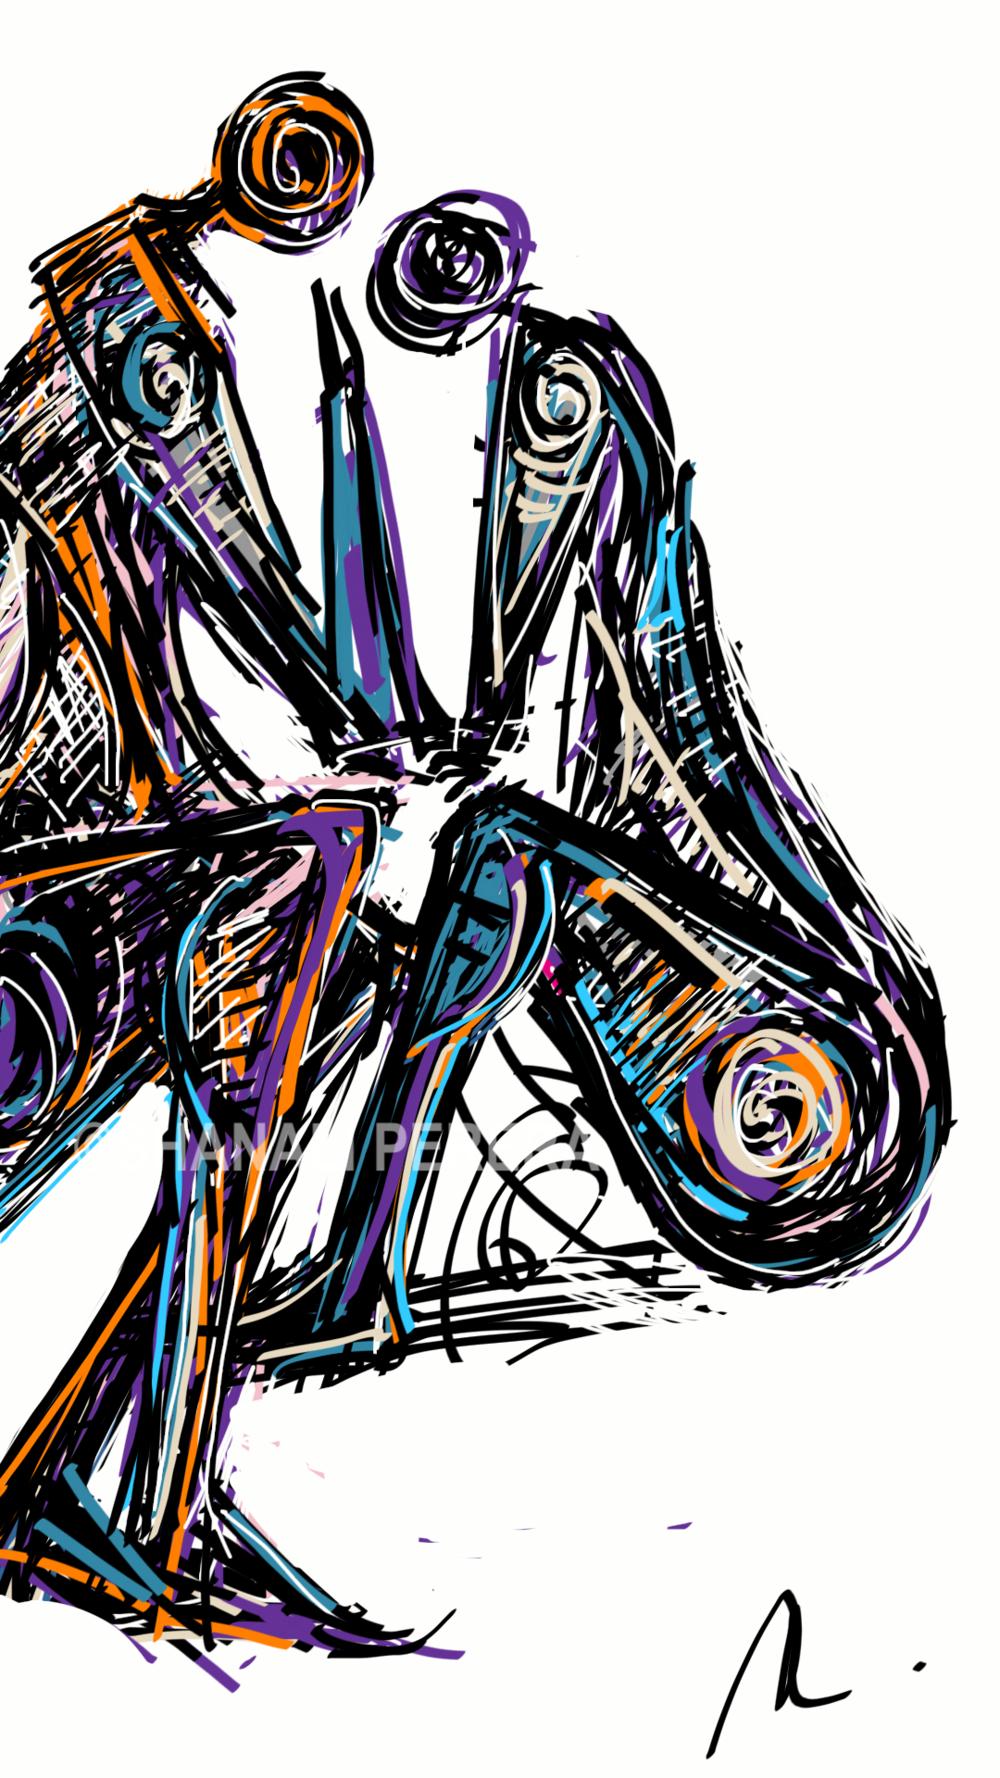 sketch-1507973020496.png